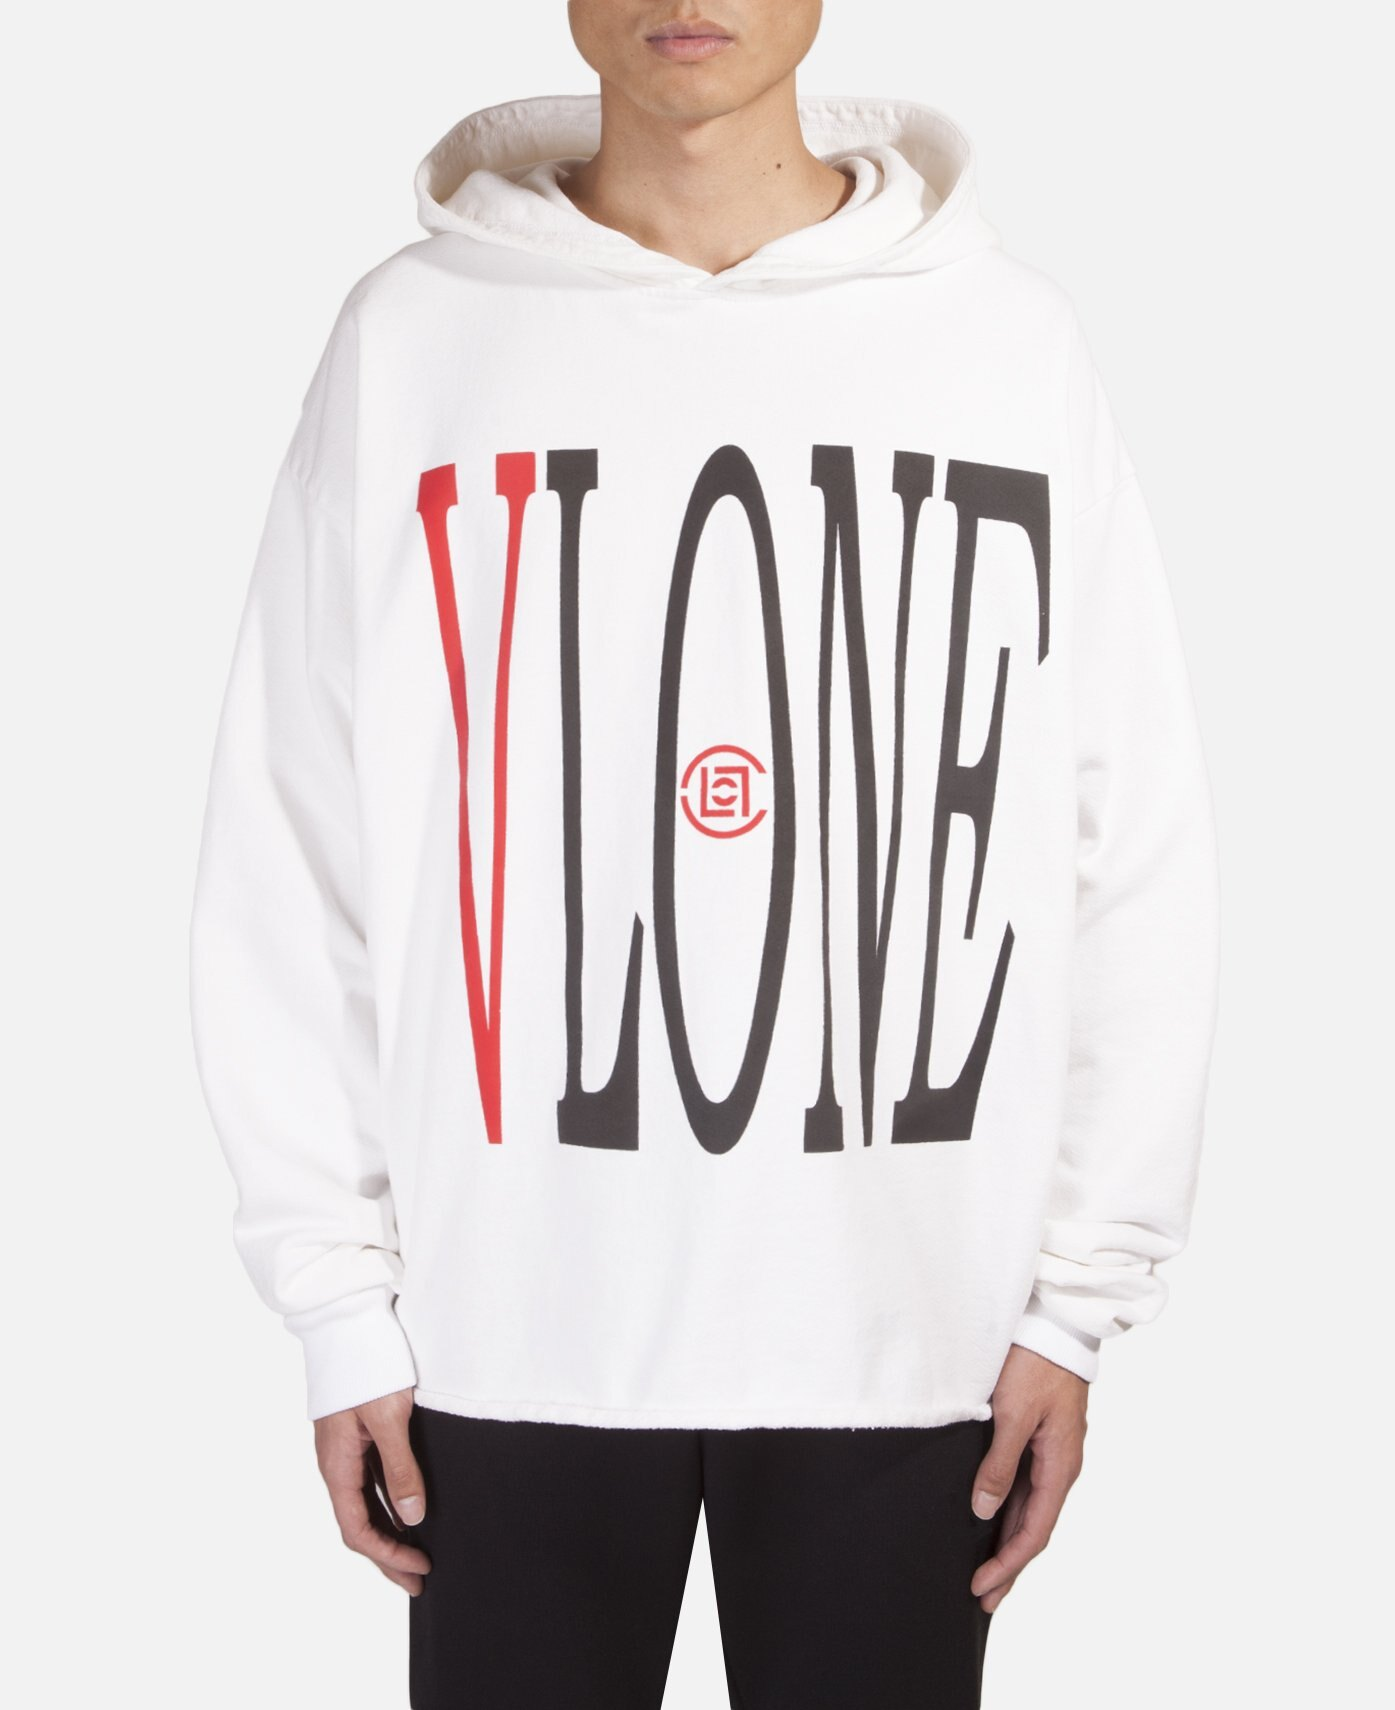 【VLONE X CLOT】VLONE X CLOT DRAGON HOODIE VL301。人氣店家JUICE的★SPECIAL SALE★有最棒的商品。快到日本NO.1的Rakuten樂天市場的安